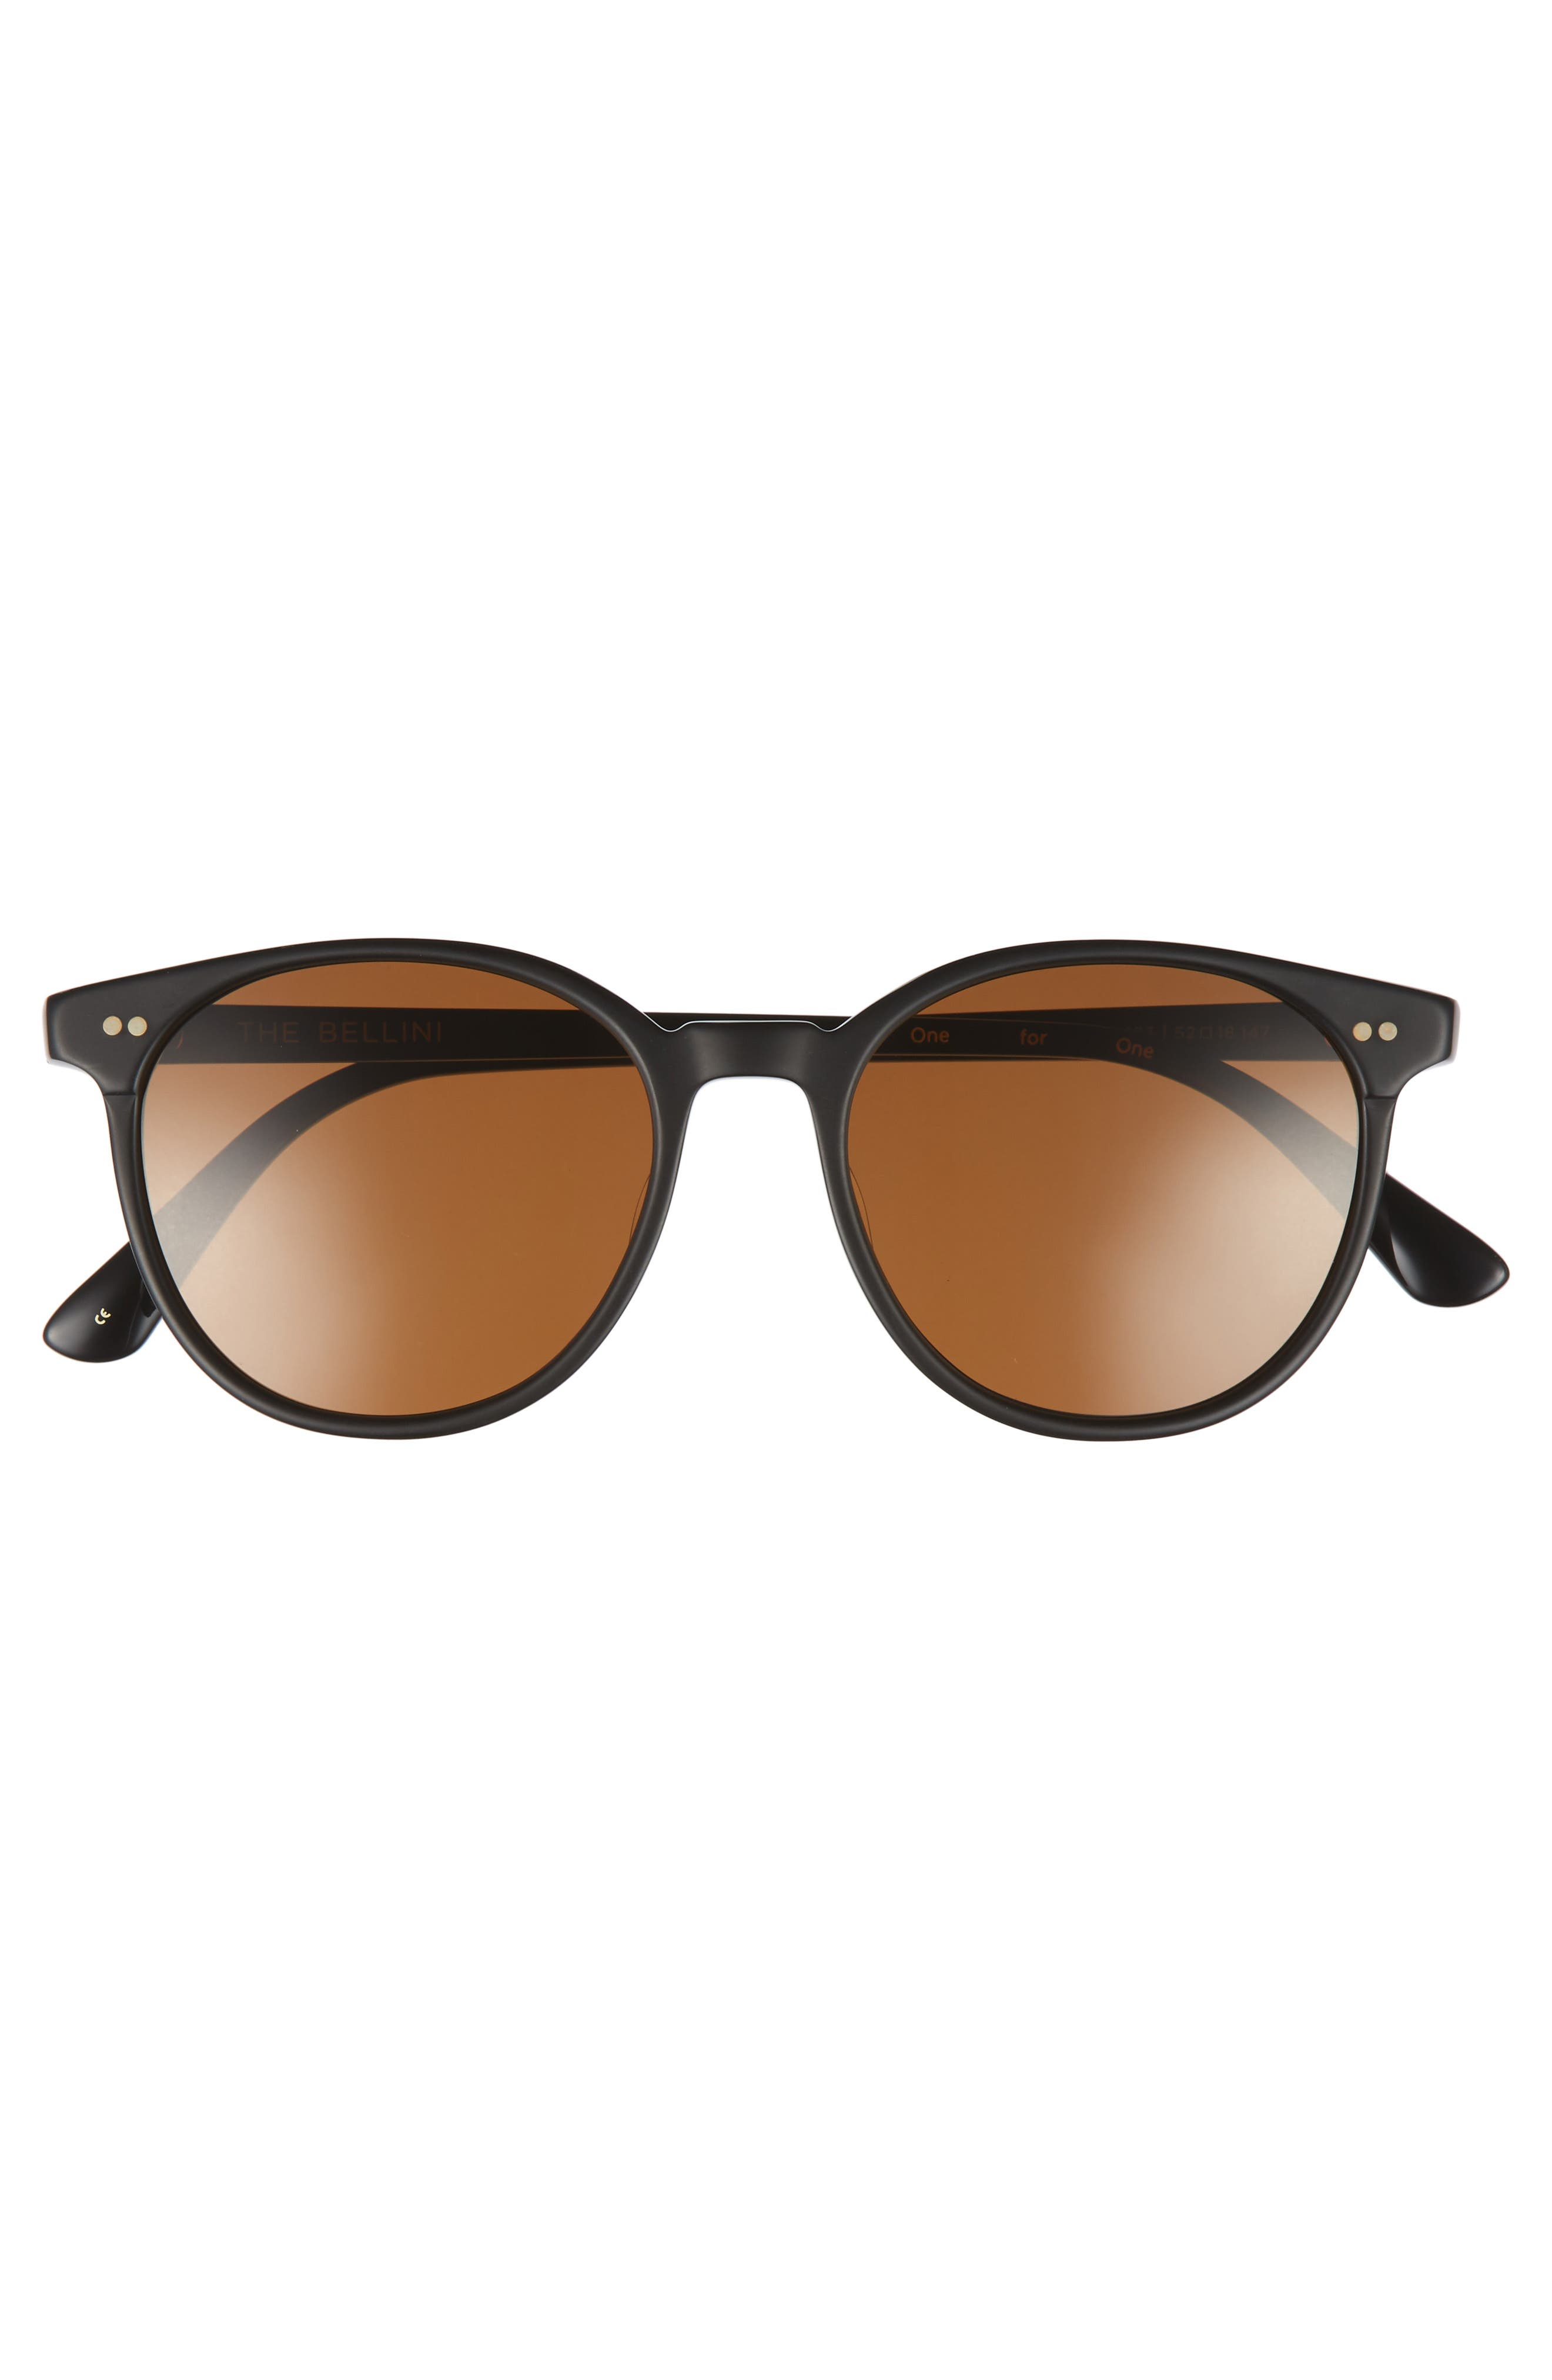 Bellini 52mm Sunglasses,                             Alternate thumbnail 2, color,                             Matte Black